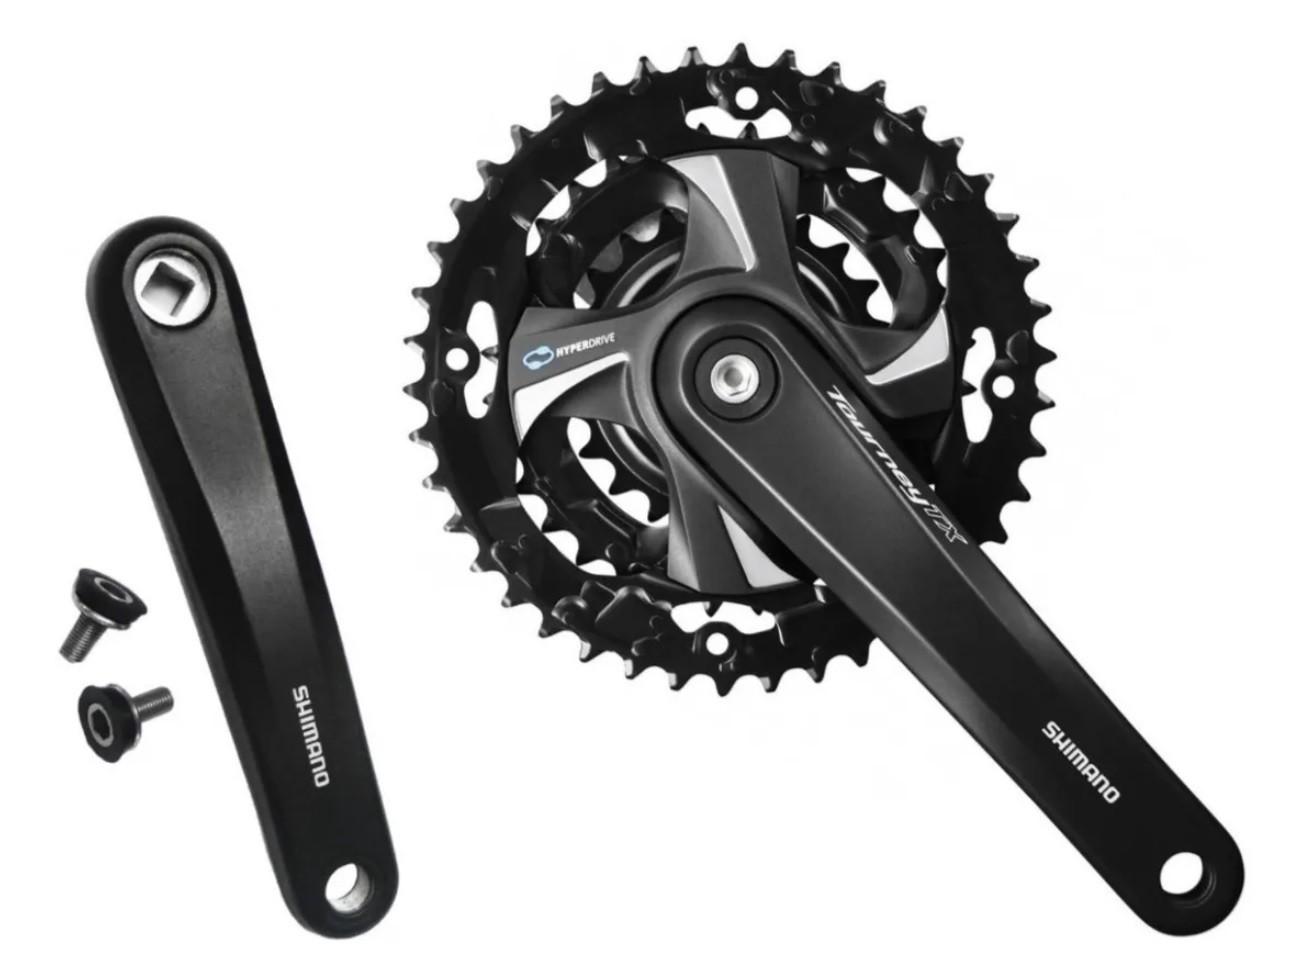 Pedivela Shimano Tourney Tx801 175mm 48/38/28 7v 8v 21v 24v  - Calil Sport Bike